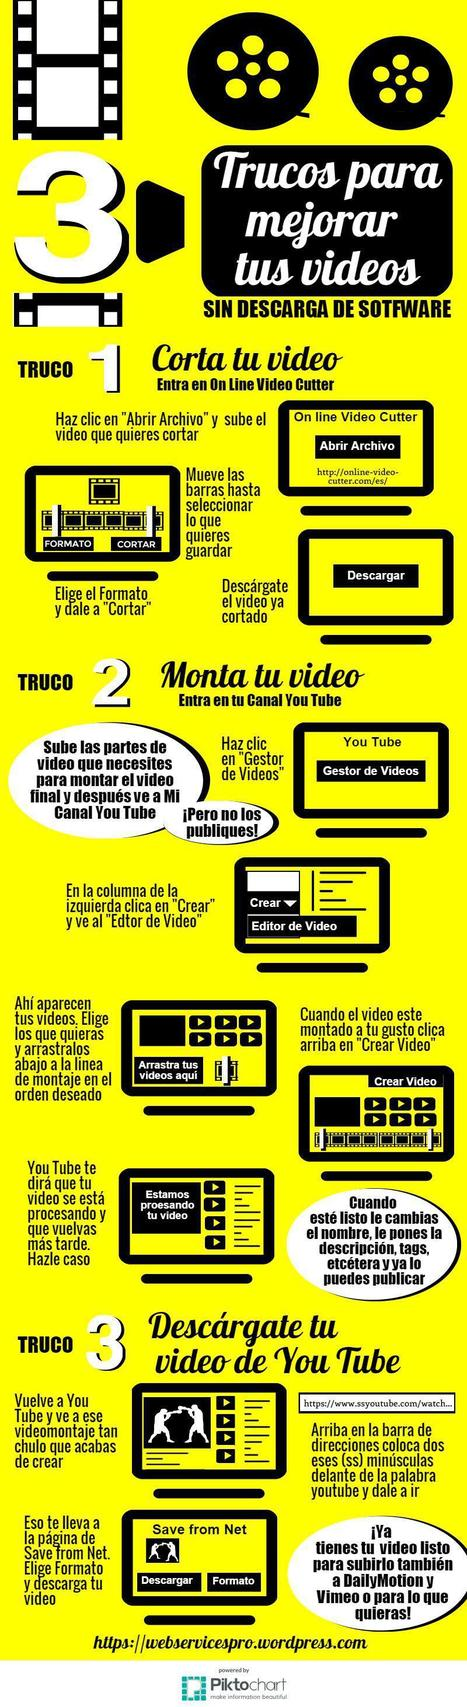 3 trucos para mejorar tus vídeos sin software #infografia #infographic | interNET | Scoop.it